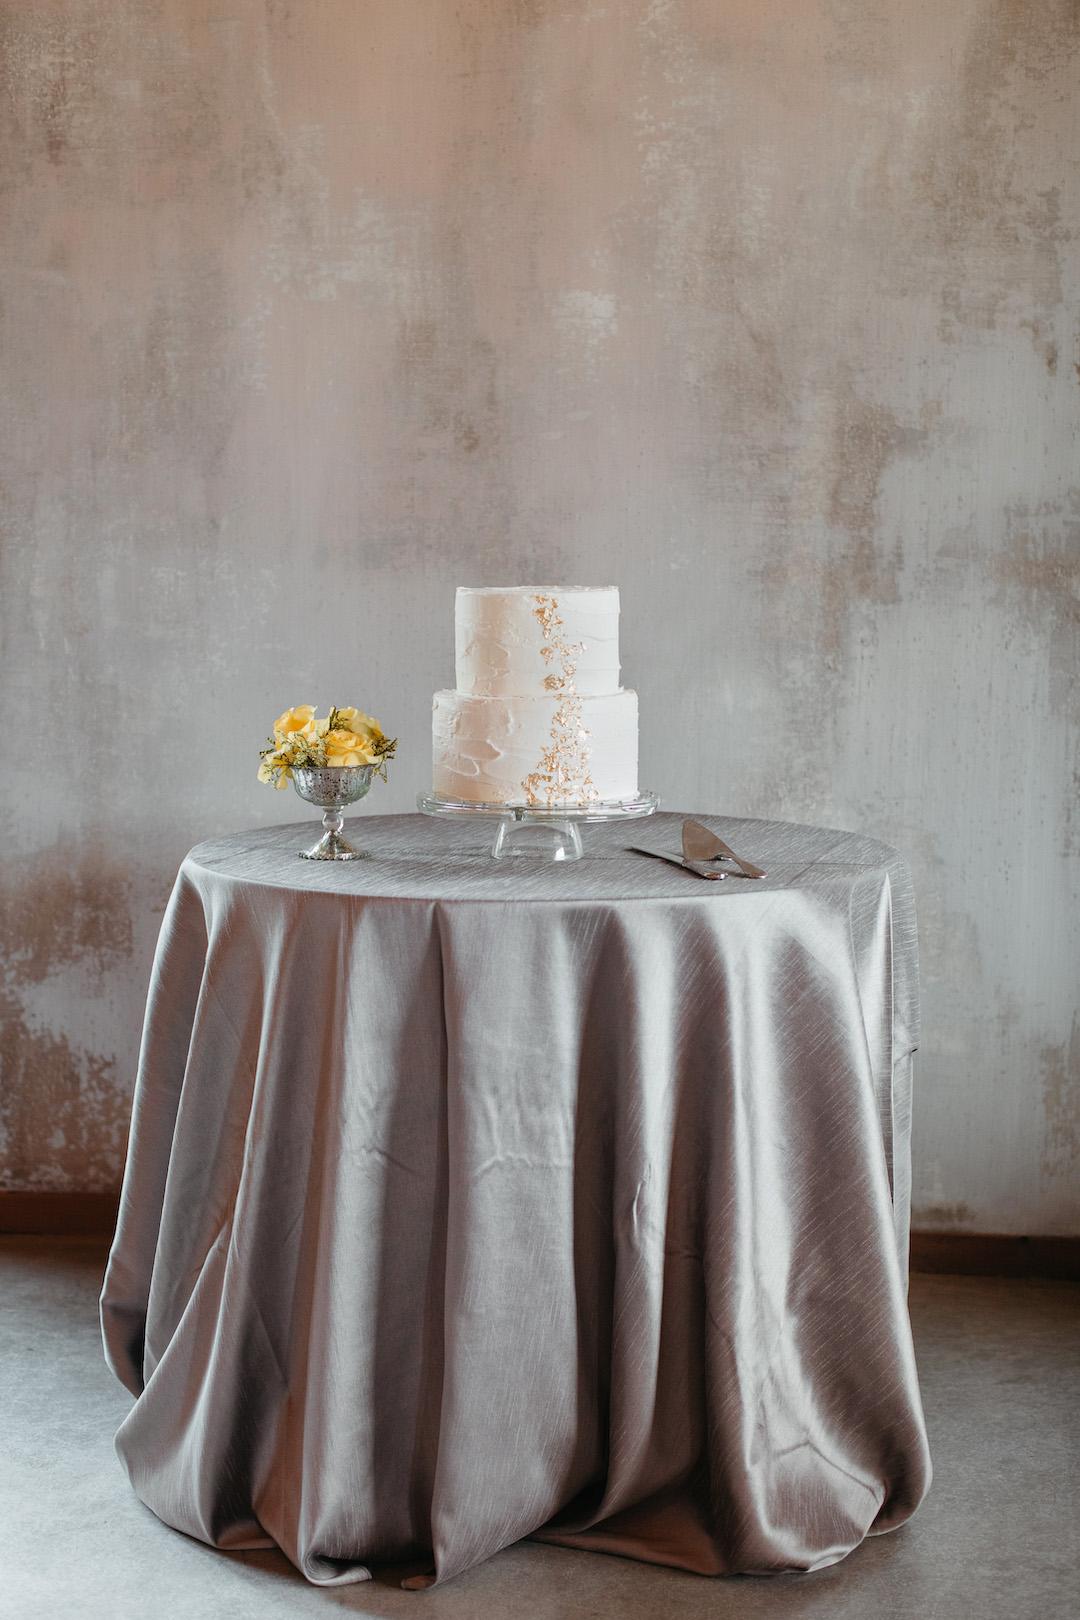 Ultimate Gray wedding table linens | Nashville Bride Guide